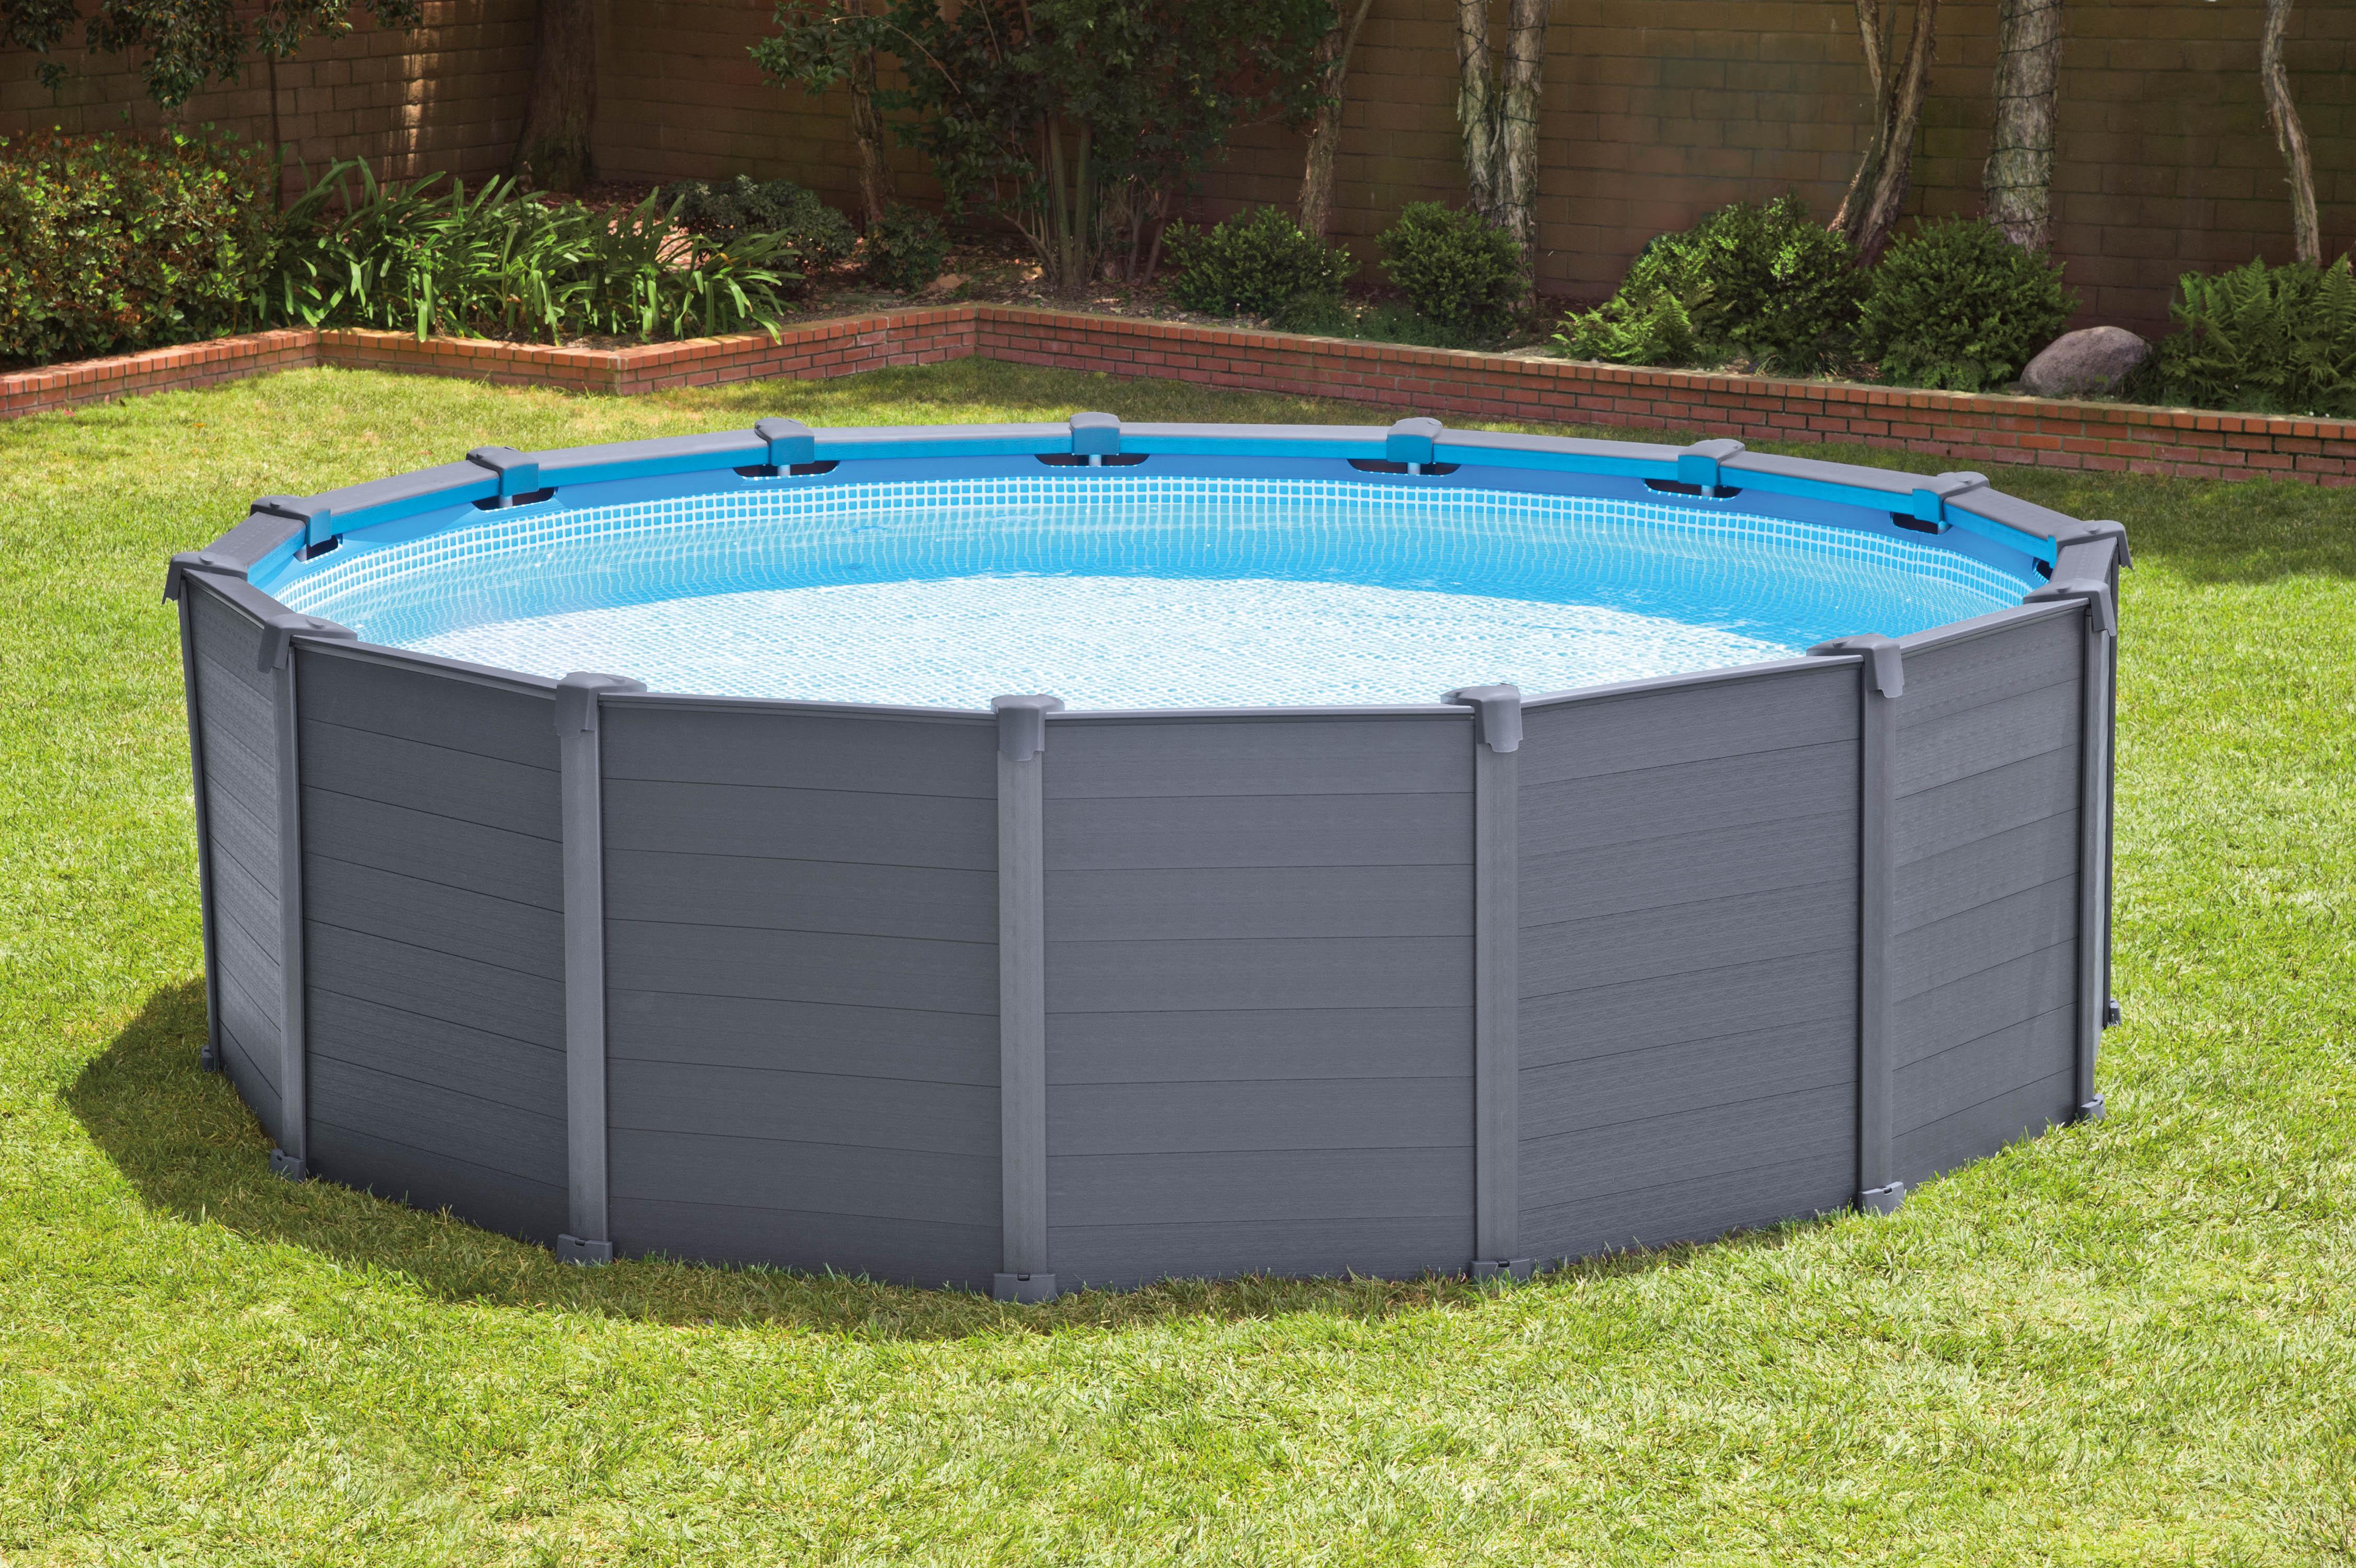 Piscina fuori terra intex graphite piscina fuori terra for Piscine fuori terra intex prezzi